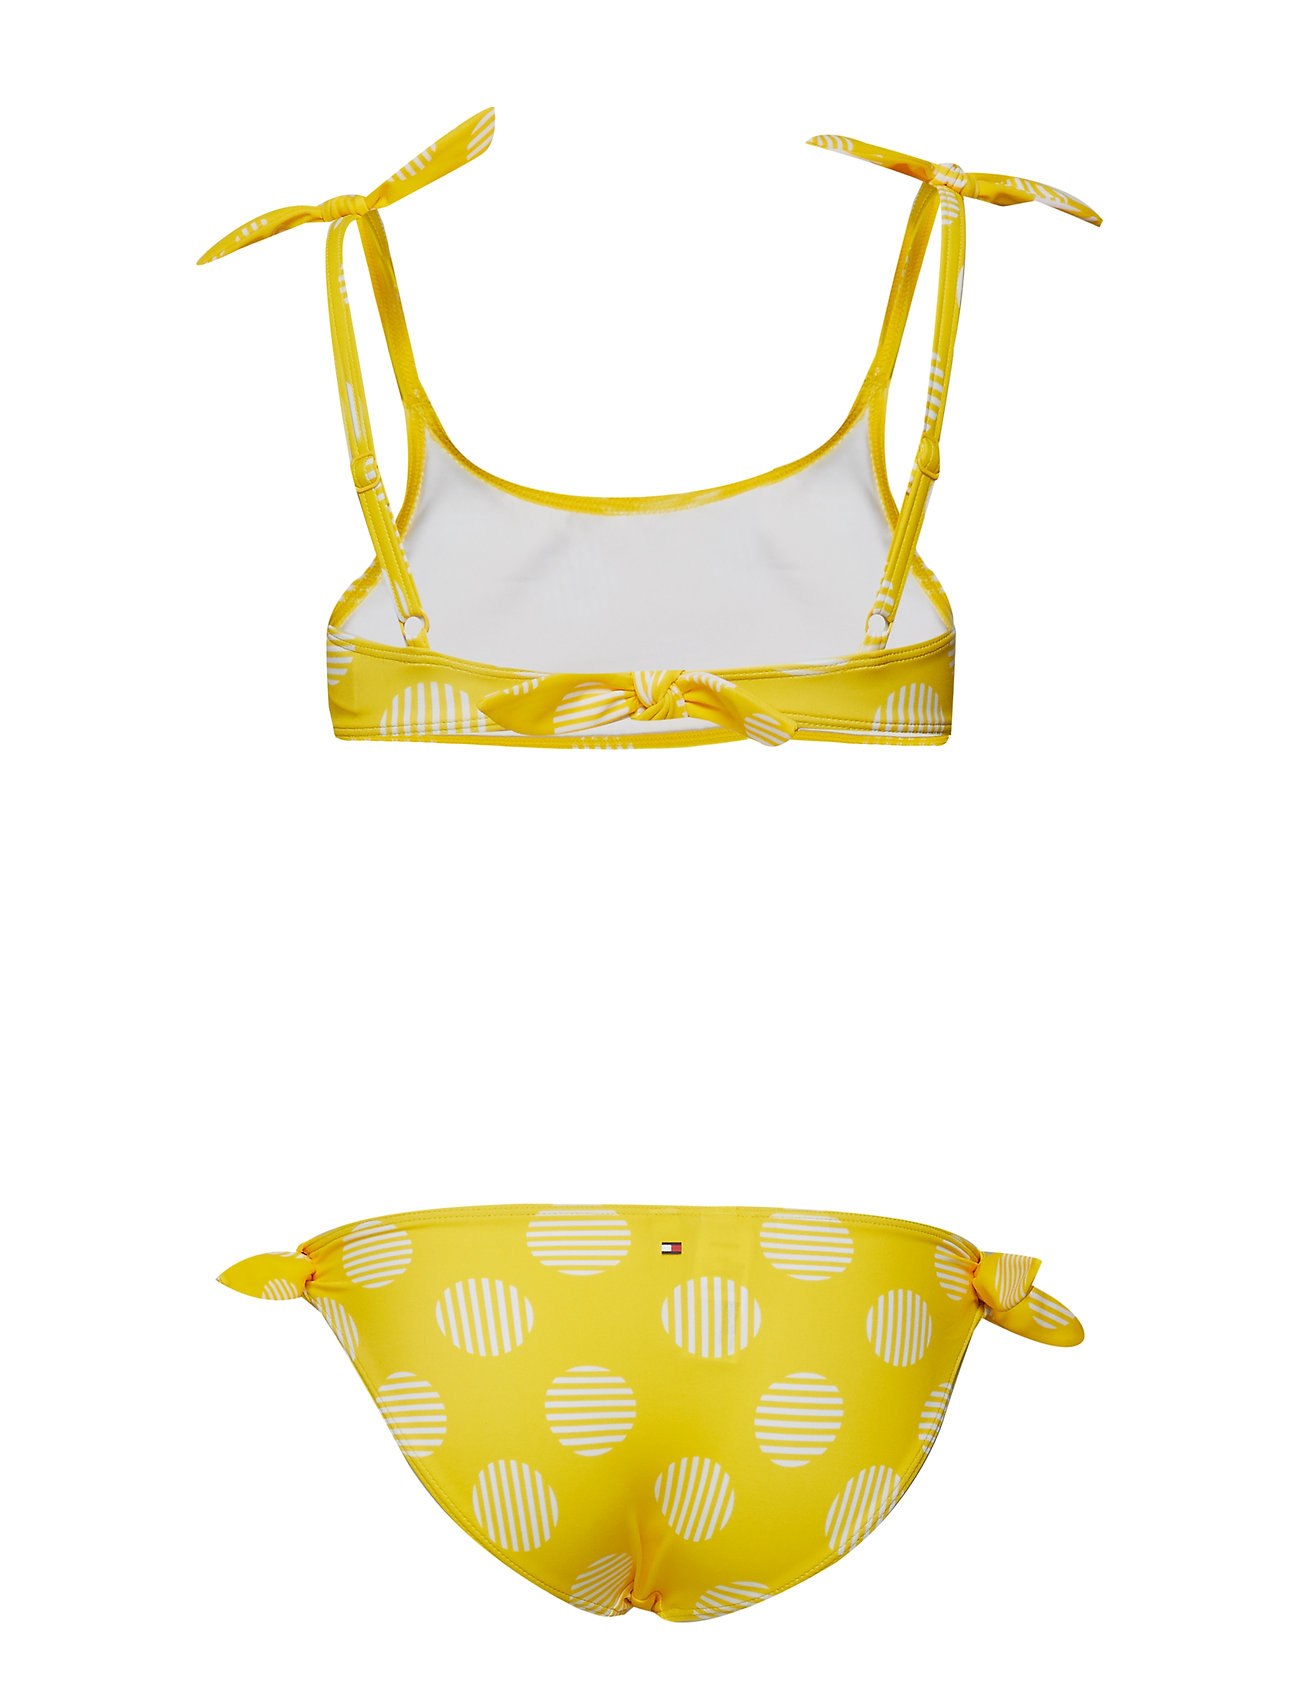 64be7e4b LOGO POLKADOT KIDS EMPIRE YELL Tommy Hilfiger Bralette Set bikinier ...